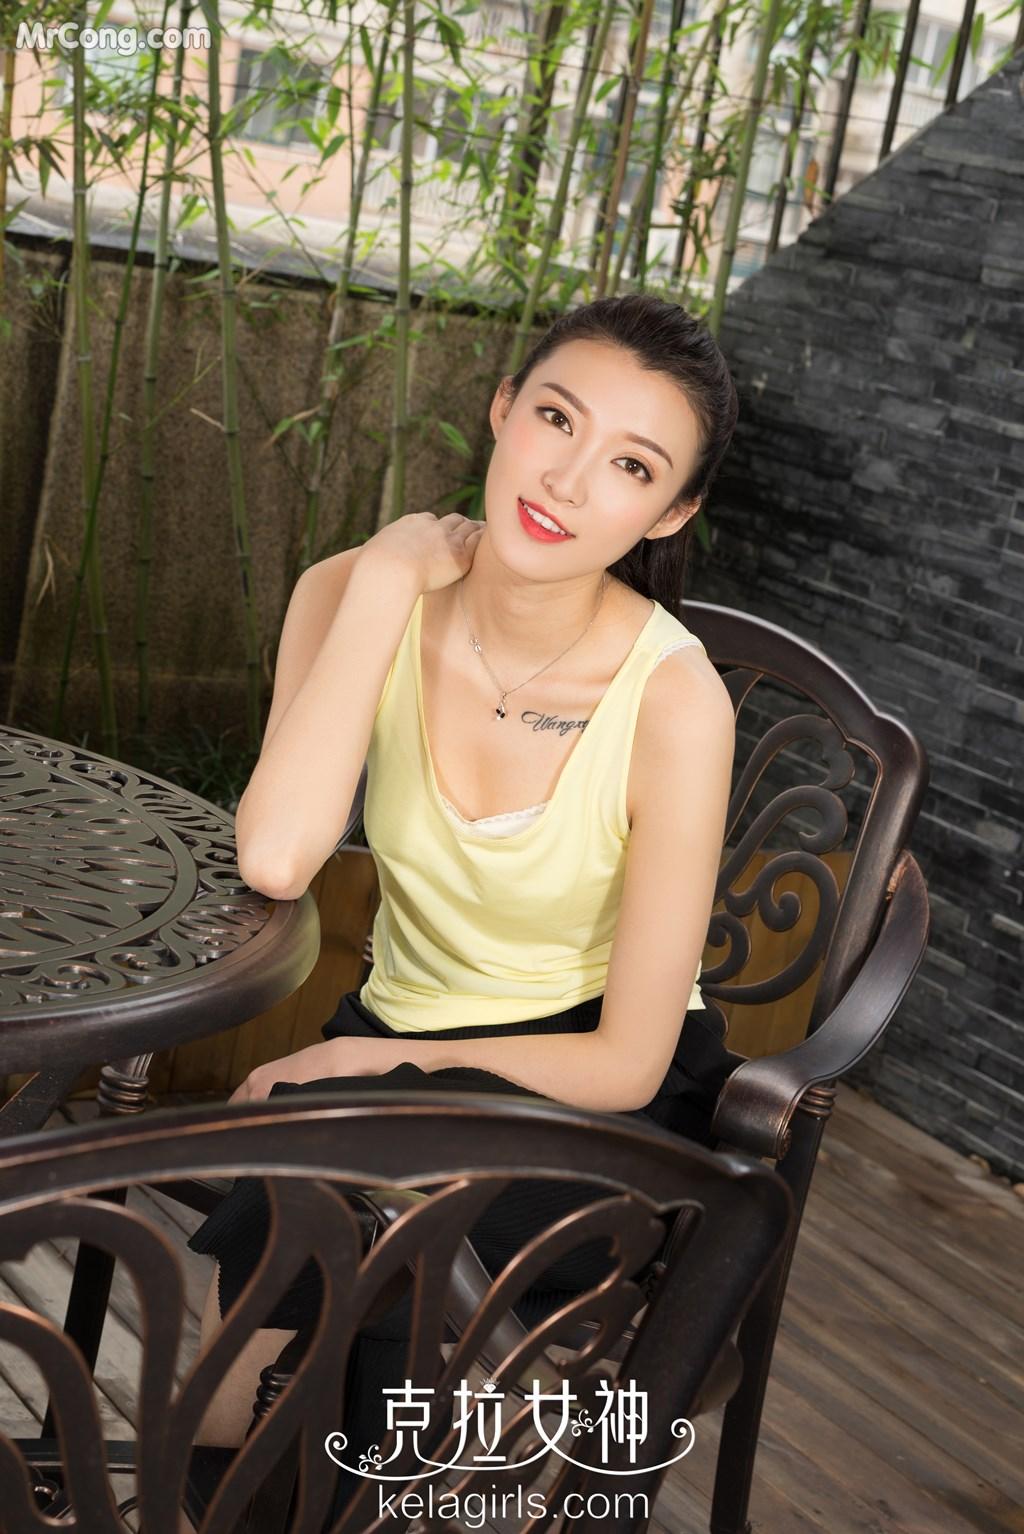 Image KelaGirls-2017-08-09-Zhao-Yujing-MrCong.com-010 in post KelaGirls 2017-08-09: Người mẫu Zhao Yujing (赵雨静) (21 ảnh)